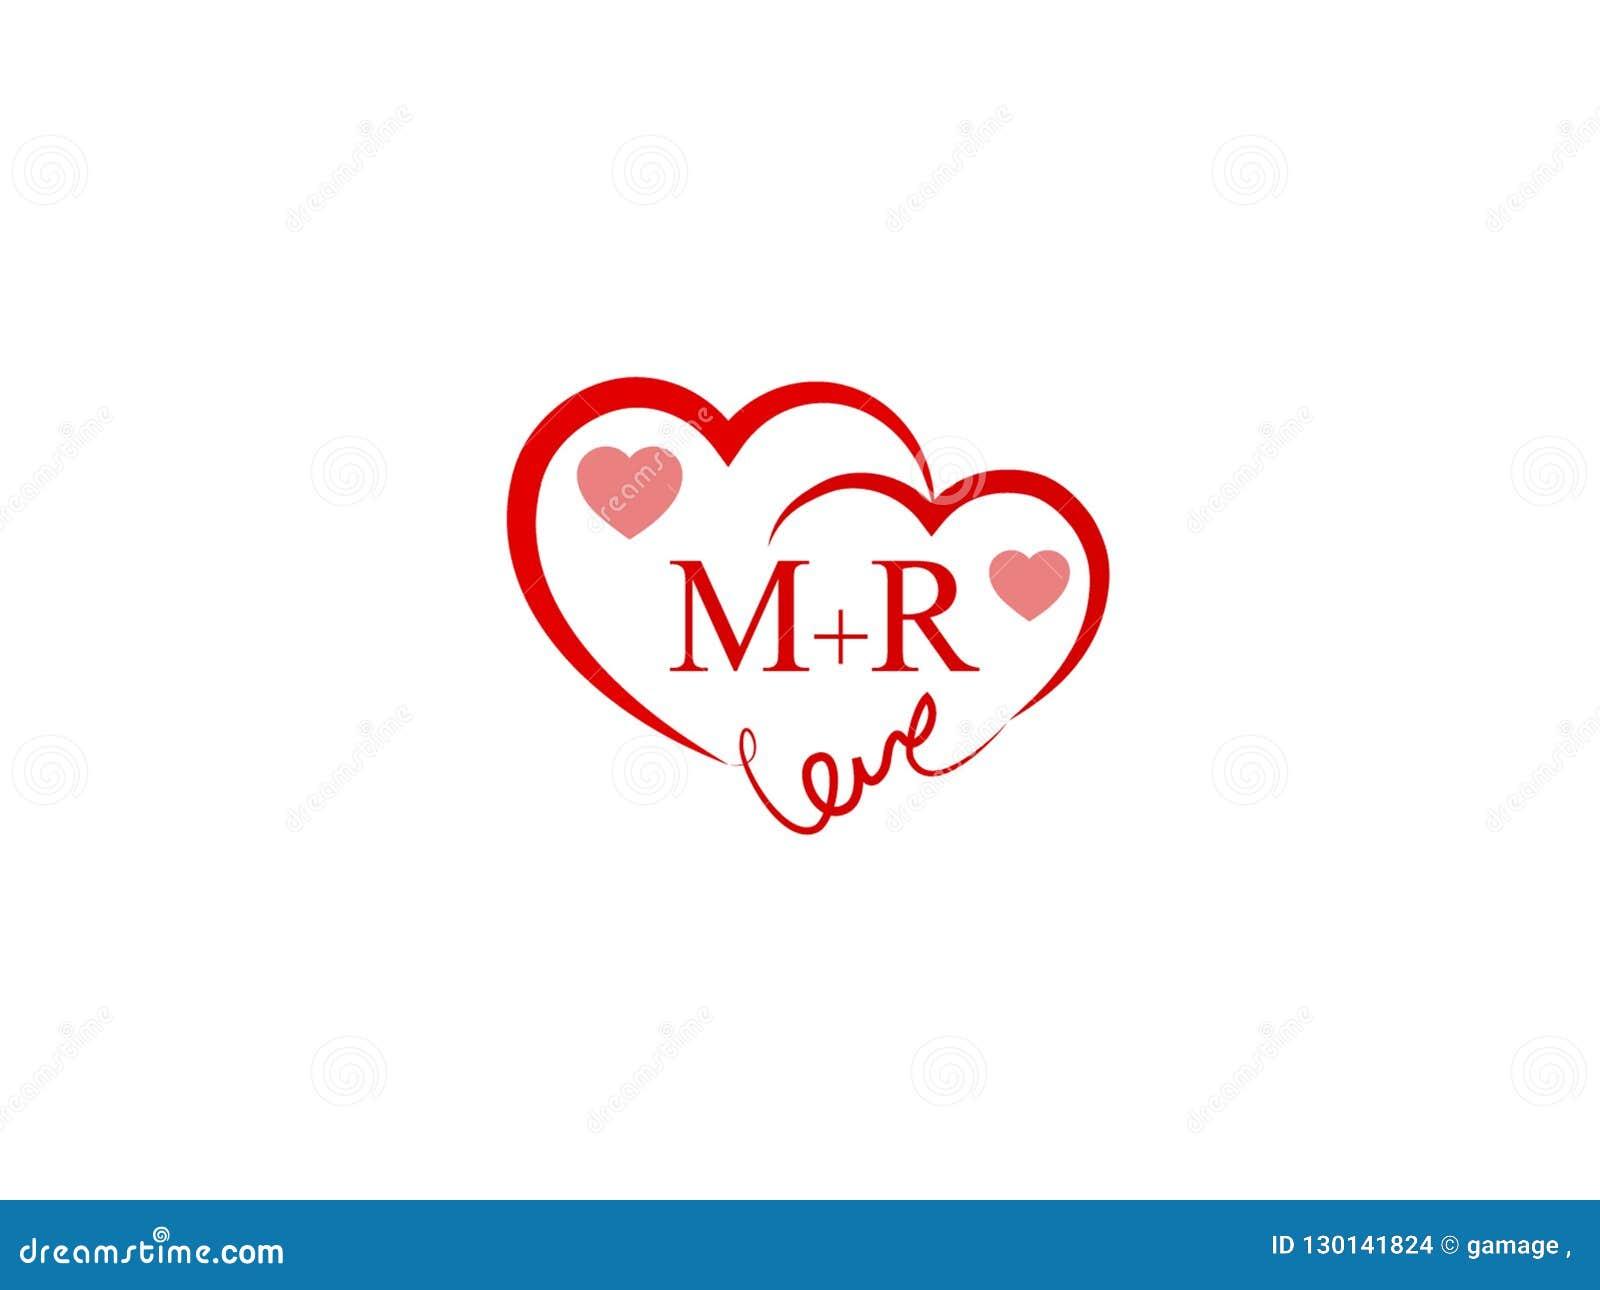 Mr Initial Heart Shape Red Colored Love Logo Stock Vector Illustration Of Letter Business 130141824 Floral letter m for girls, m. https www dreamstime com mr initial heart shape red colored love logo letter design wedding invitation name business image130141824